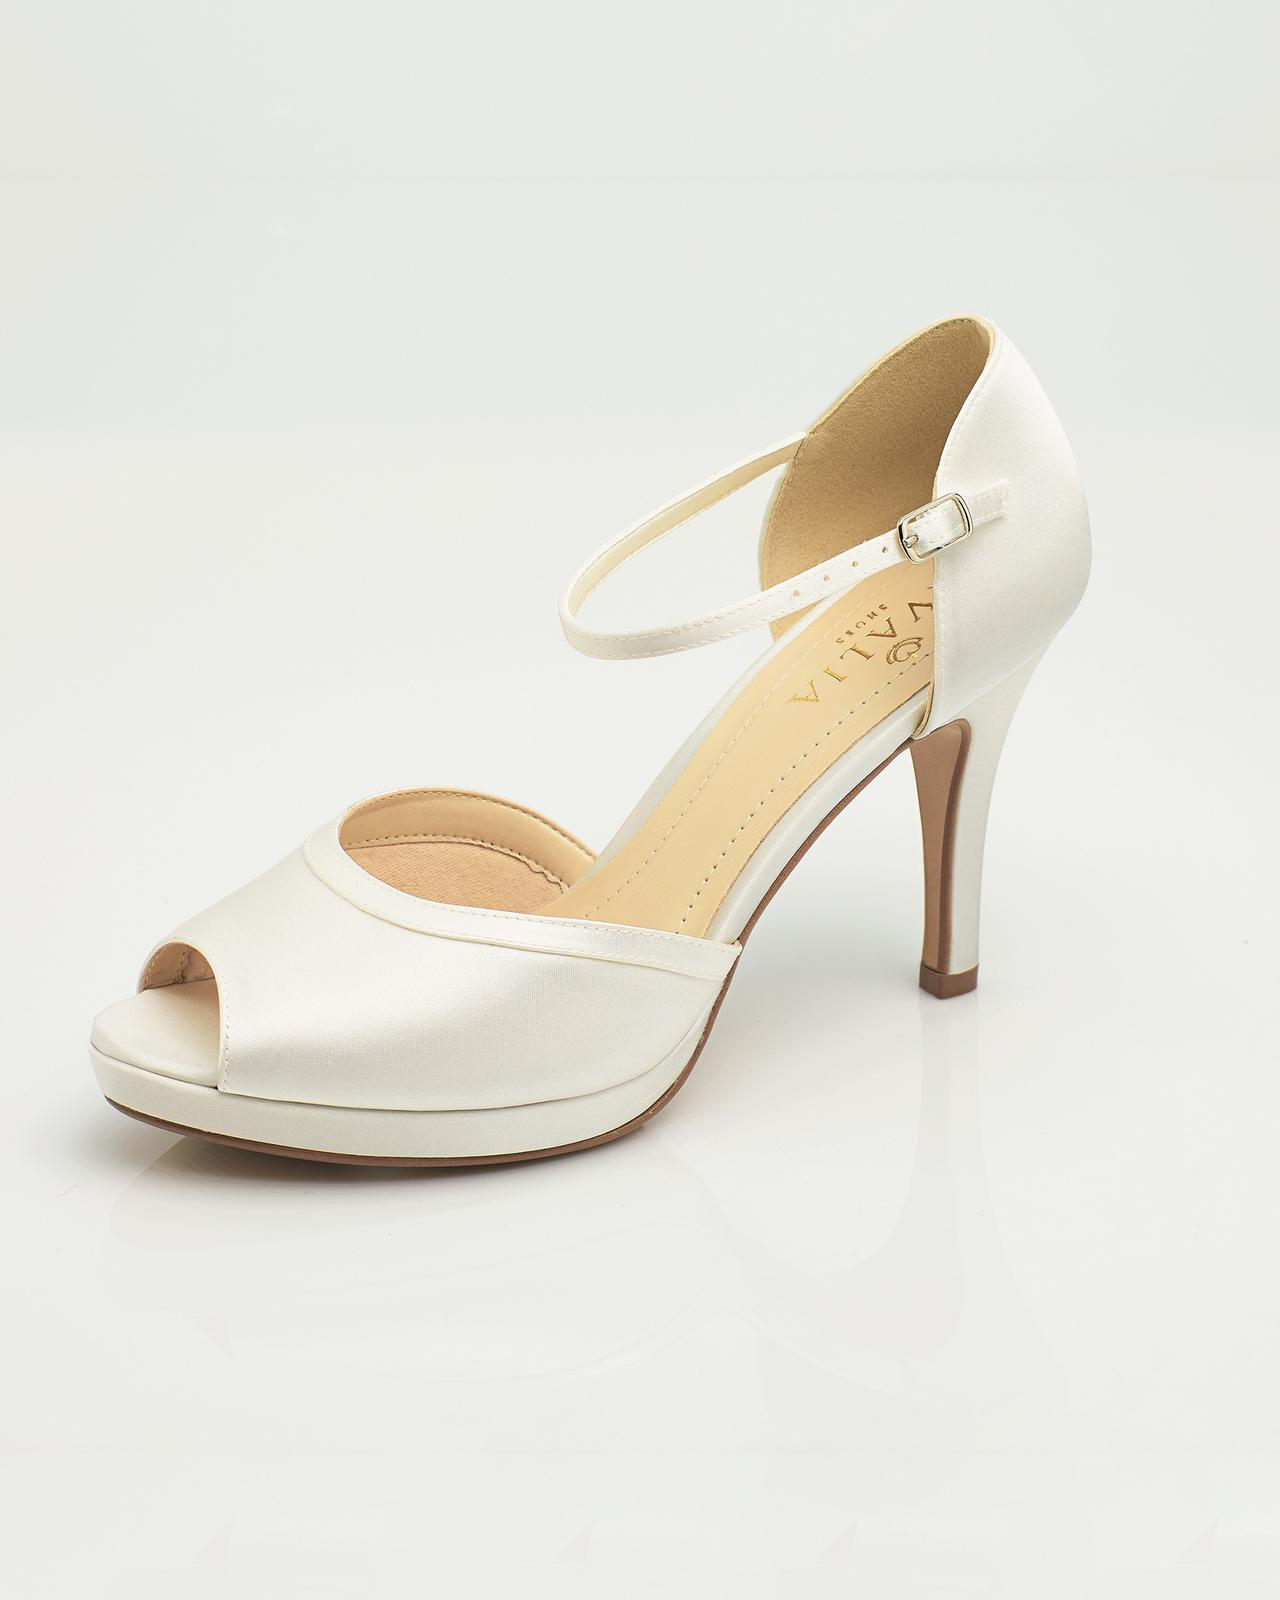 Svadobné topánky Ines - Obrázok č. 1